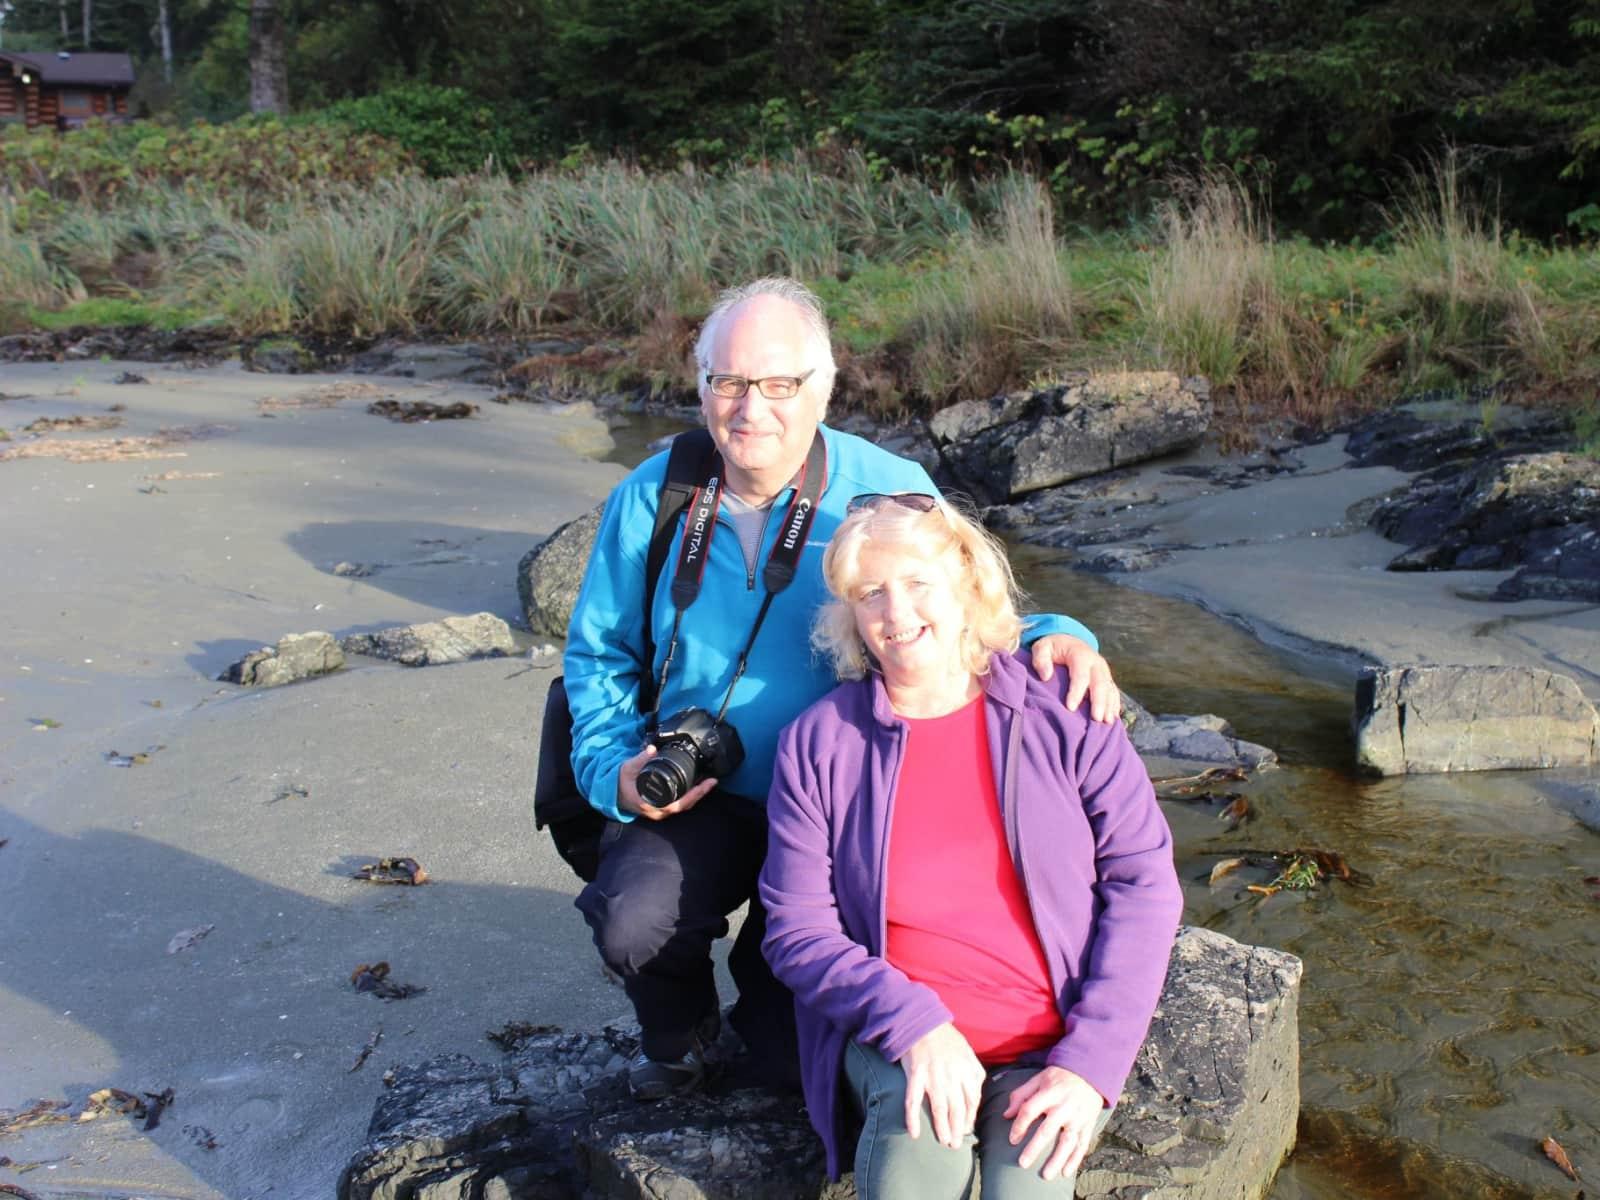 Les & Anita from Hastings, United Kingdom